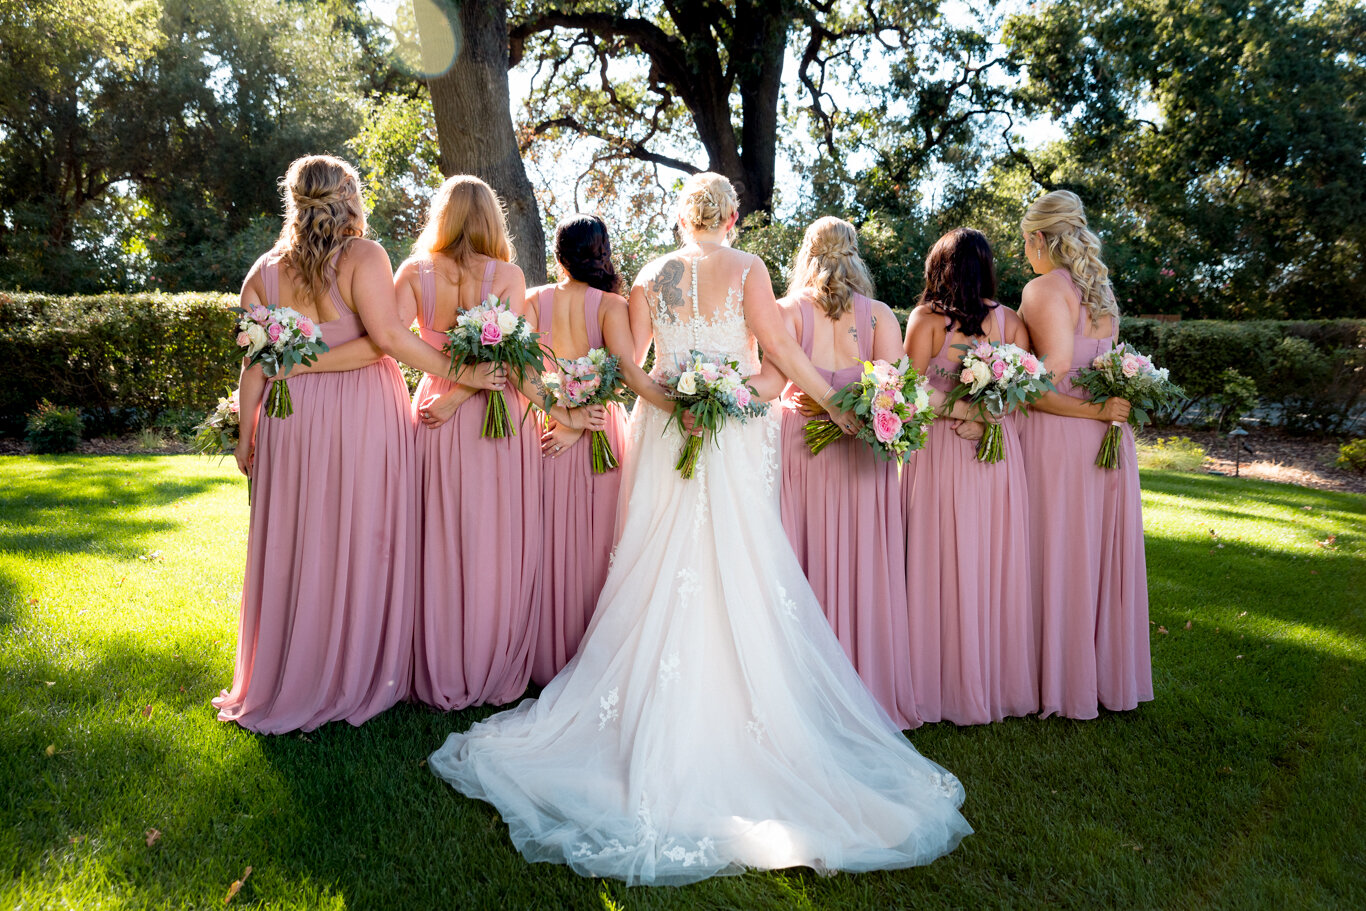 2019.08.24_Emily-Ashir-Wedding-at-the-Maples-5670.jpg